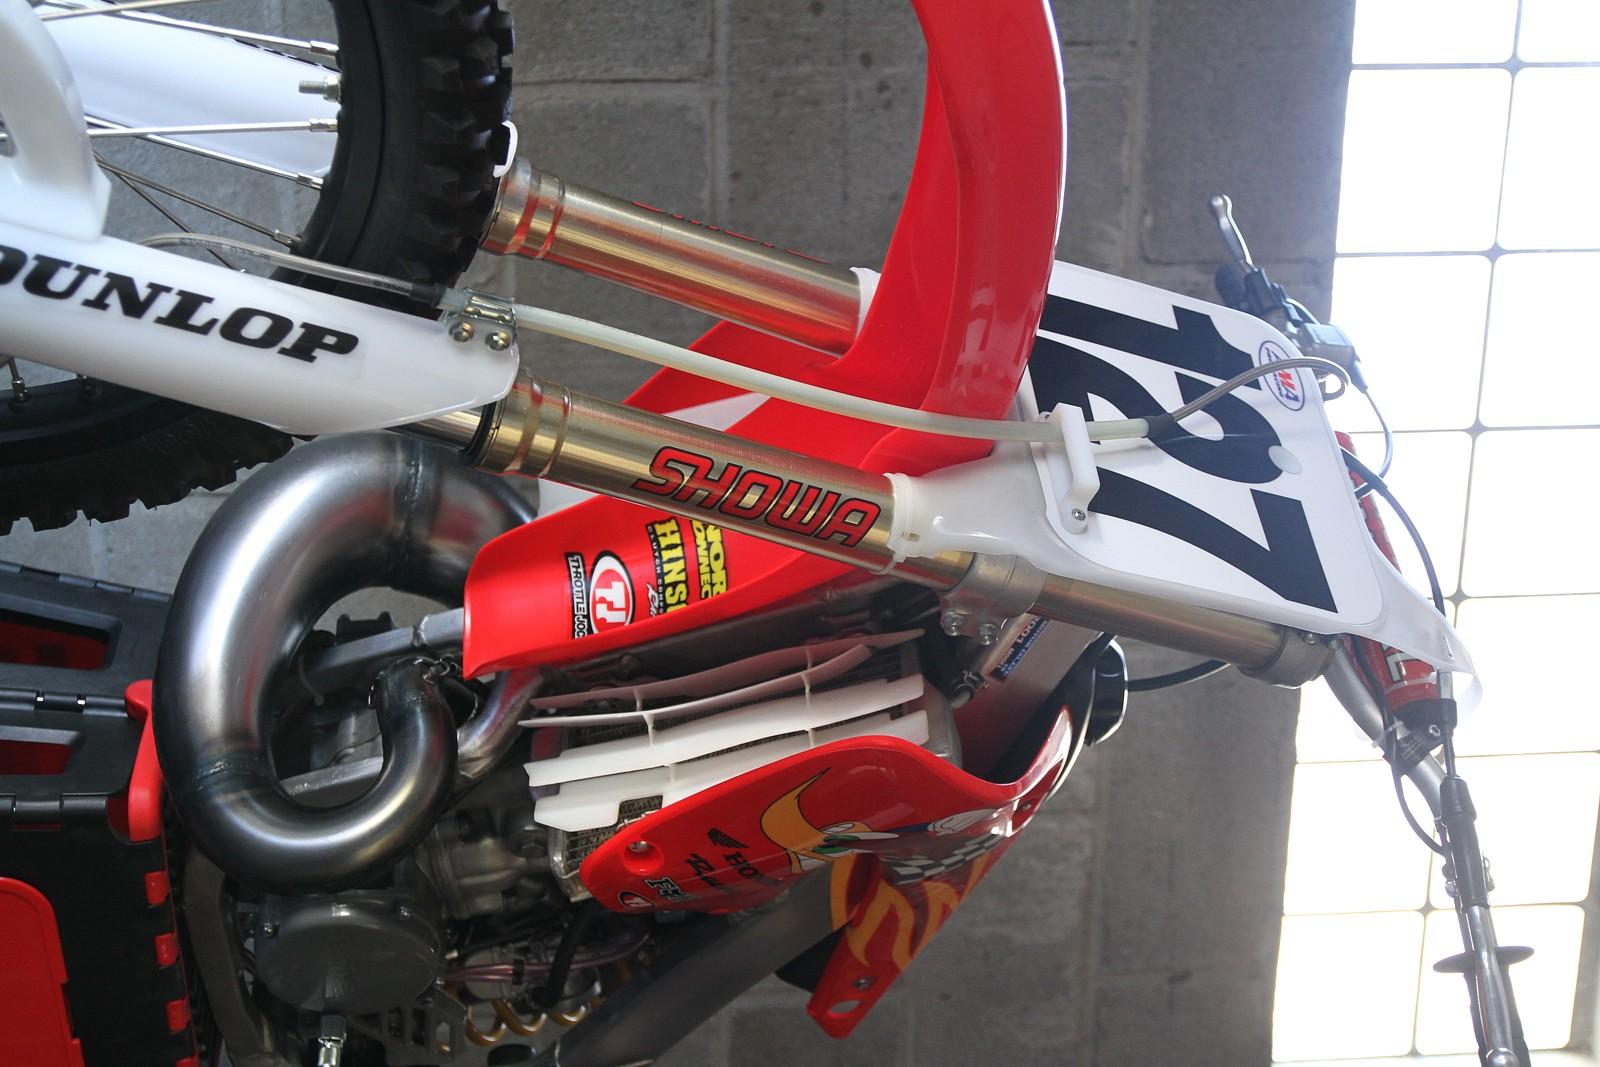 0B2B23B2-A7C7-4625-9499-5073422C8E8B - Godcho - Motocross Pictures - Vital MX